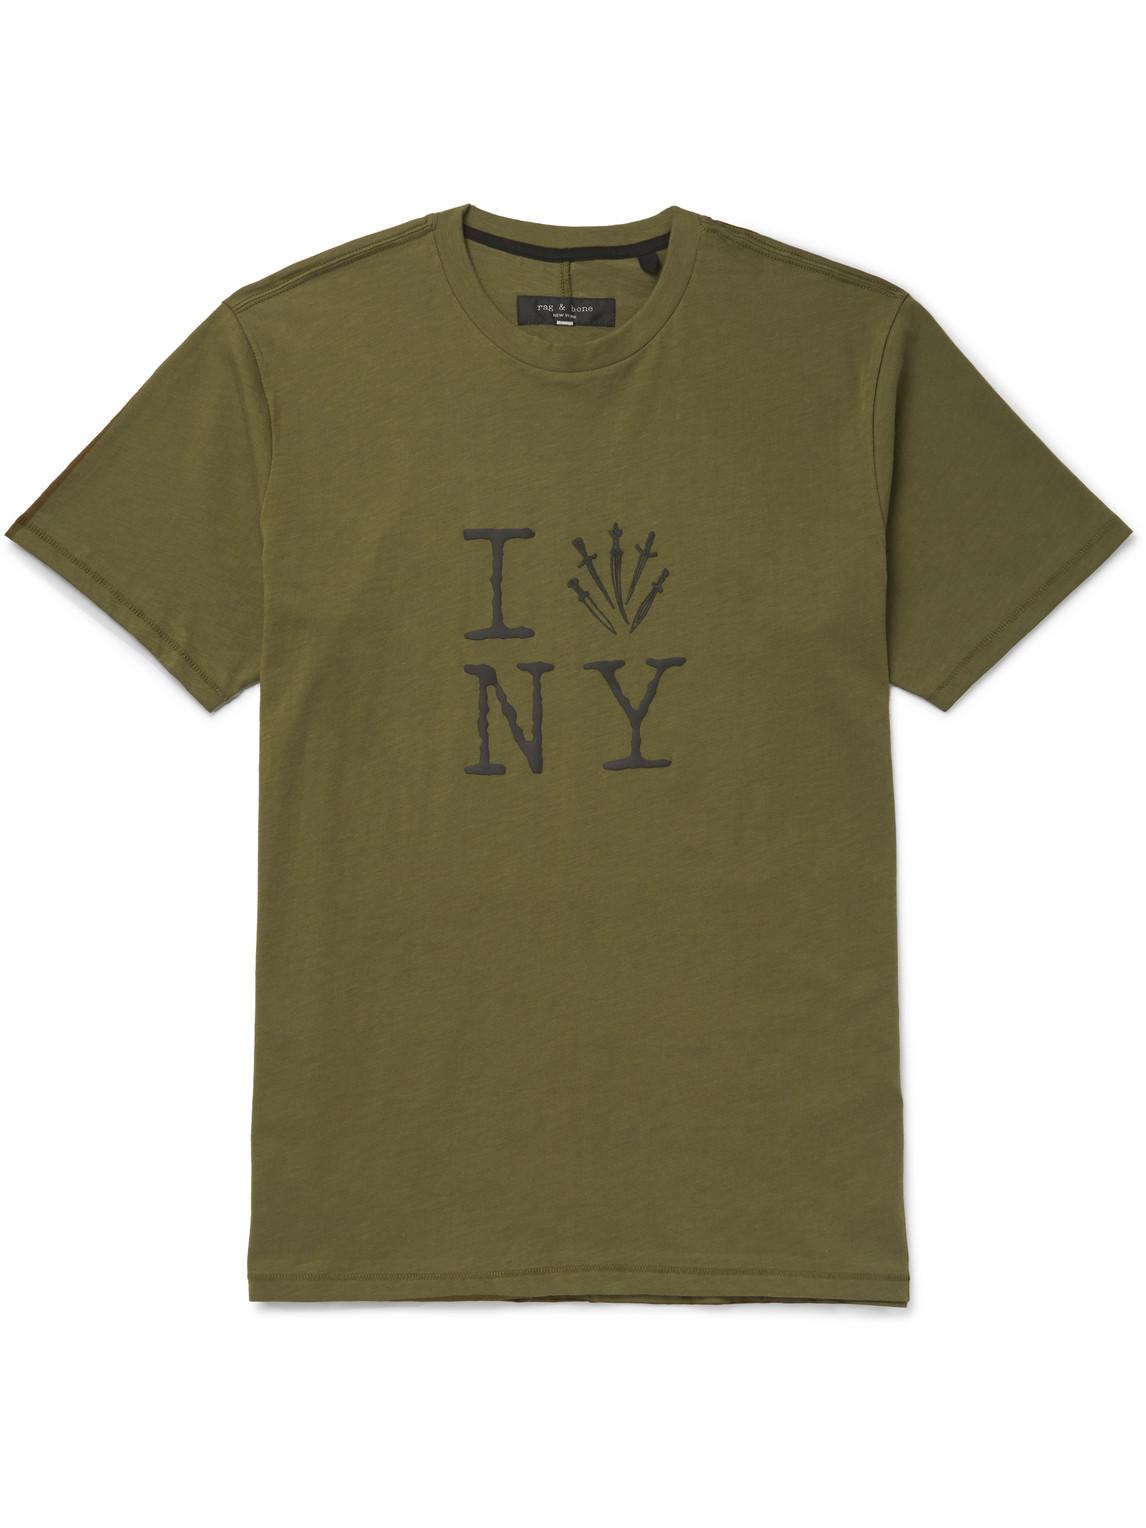 rag amp; bone - slim-fit printed cotton-jersey t-shirt - men - green - s